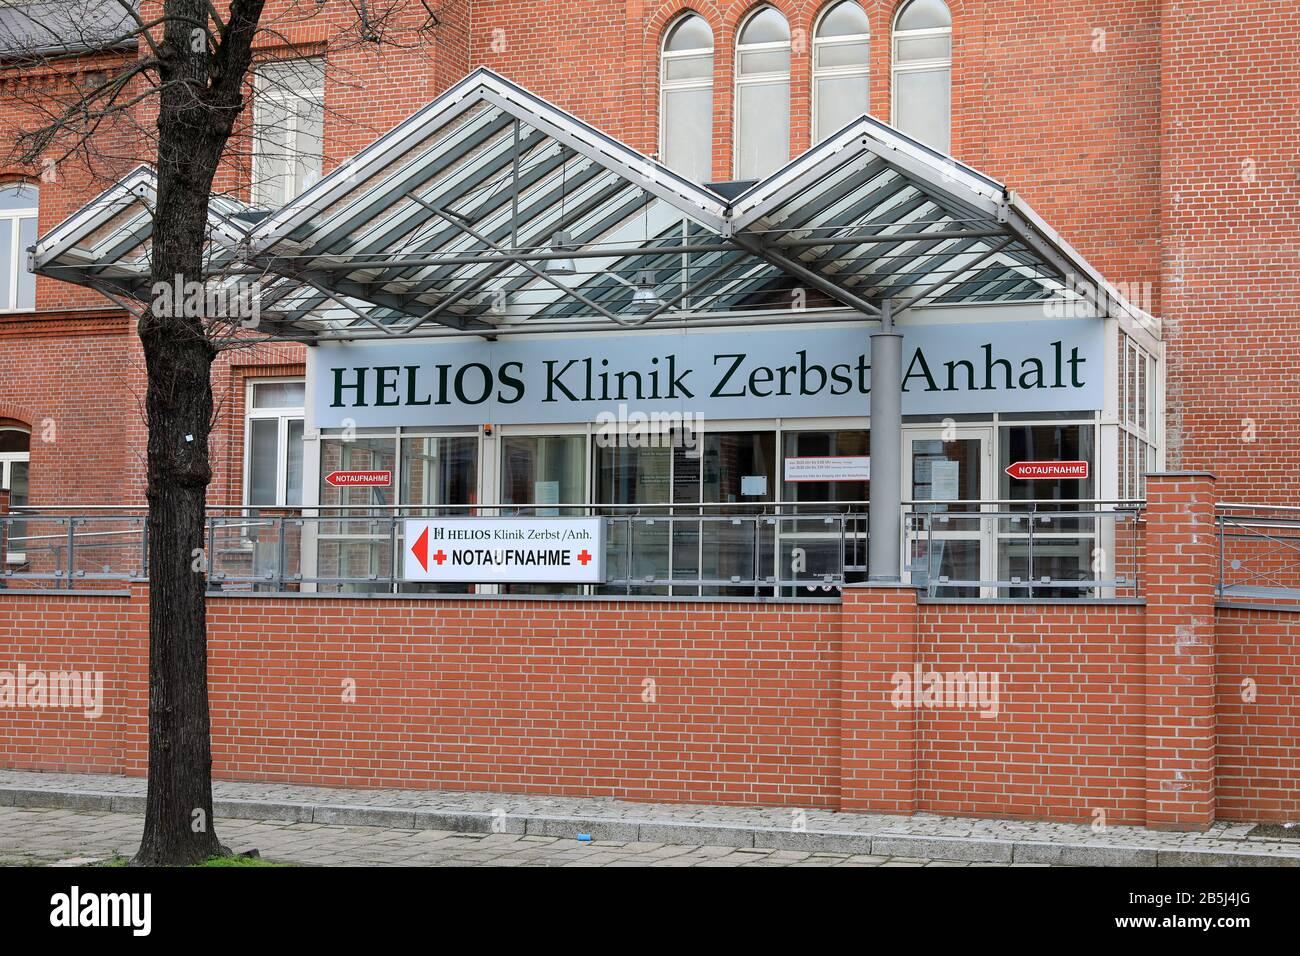 Zerbst, Germany. 08th Mar, 2020. The HELIOS Klinik Zerbst-Anhalt. Credit: Peter Gercke/dpa-Zentralbild/dpa/Alamy Live News Stock Photo